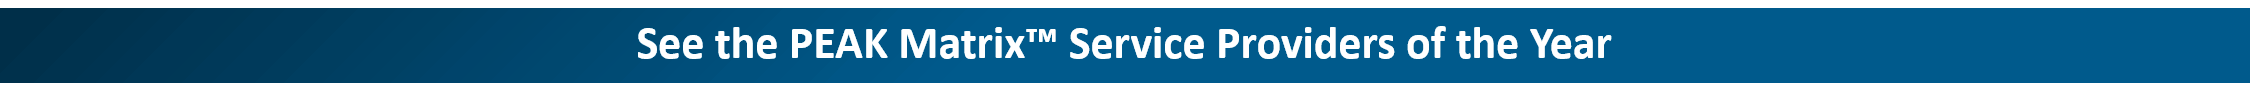 rectangular blue strip with text